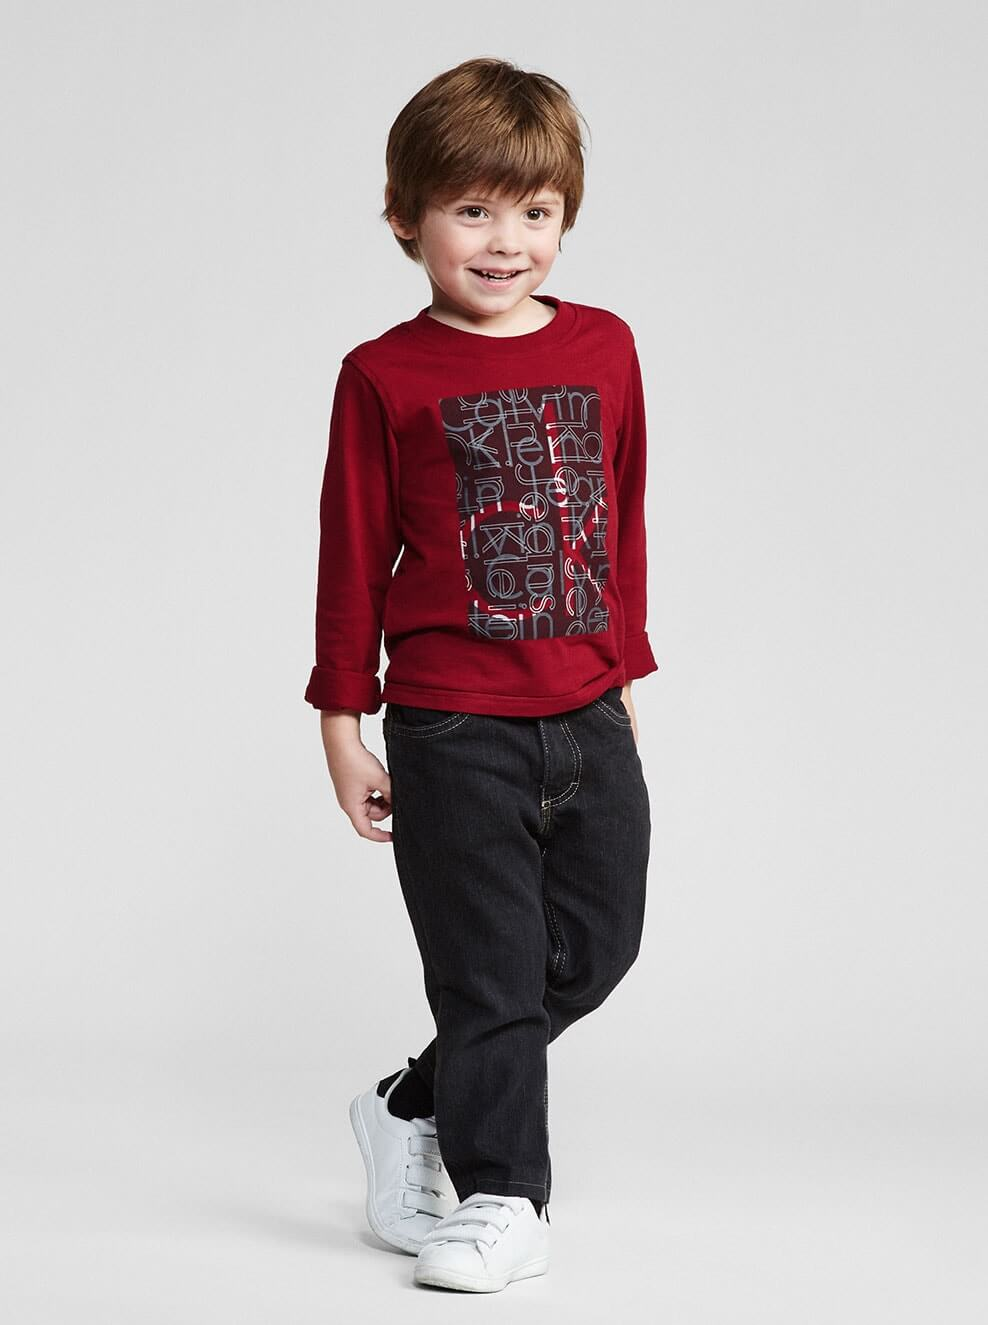 Kids calvin klein for Dark denim toddler shirt